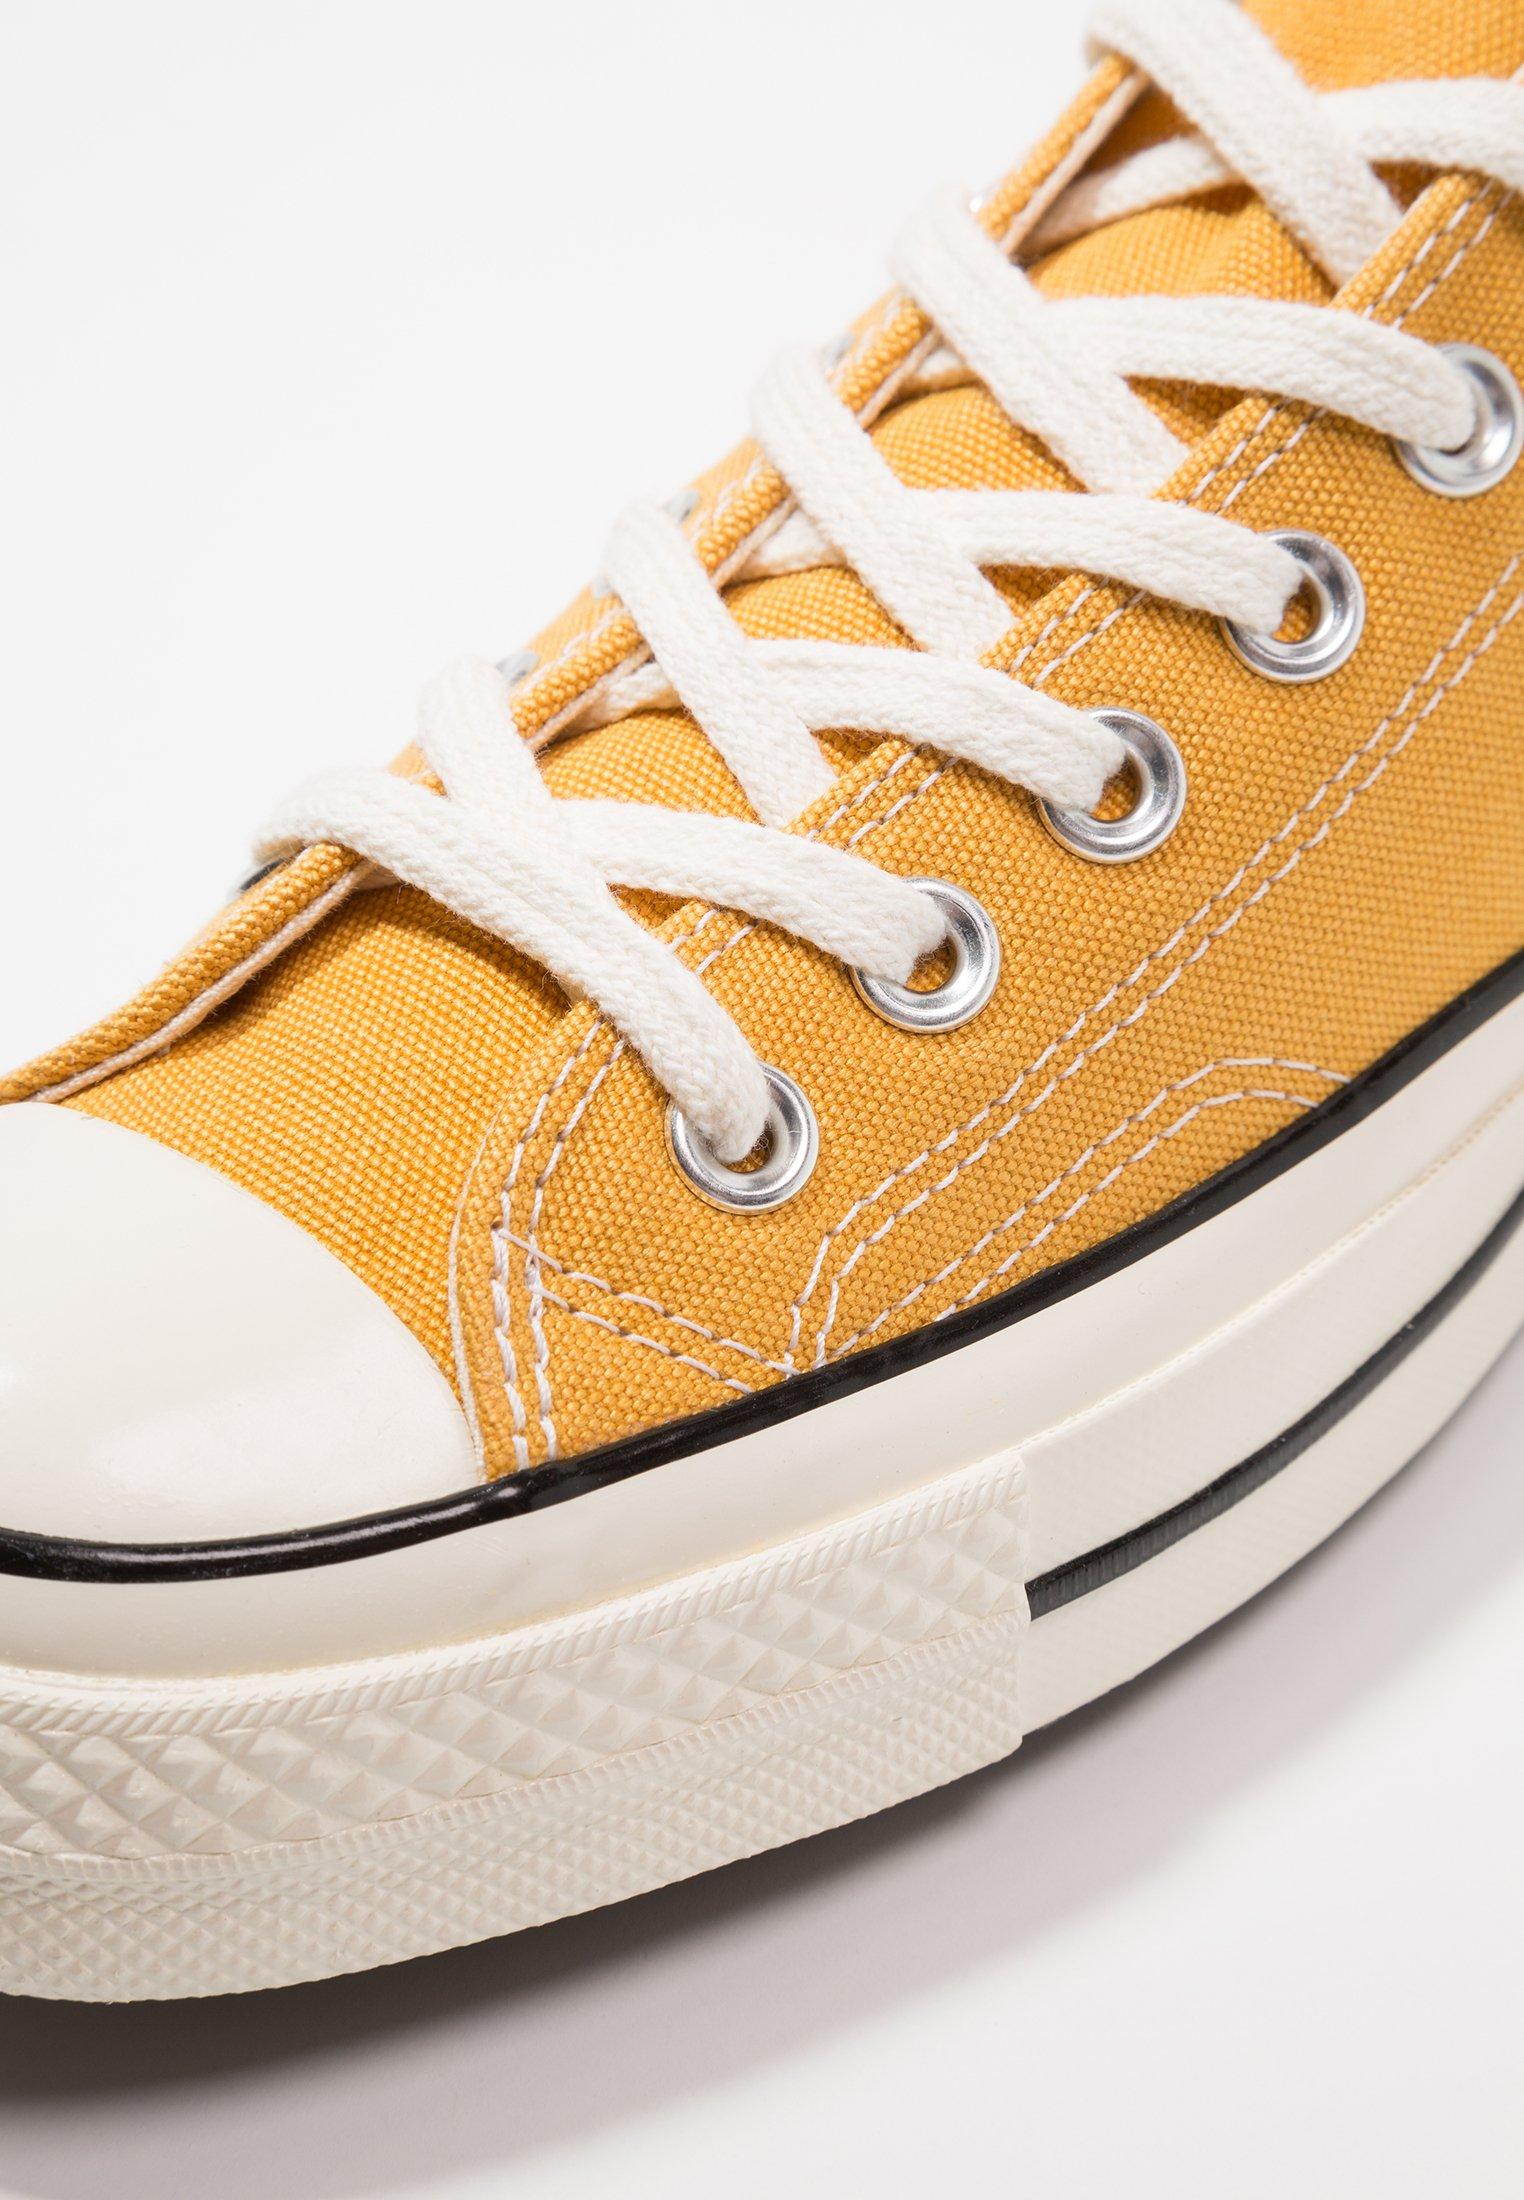 Converse Chuck Taylor All Star '70 Ox - Baskets Basses Sunflower/black/egret